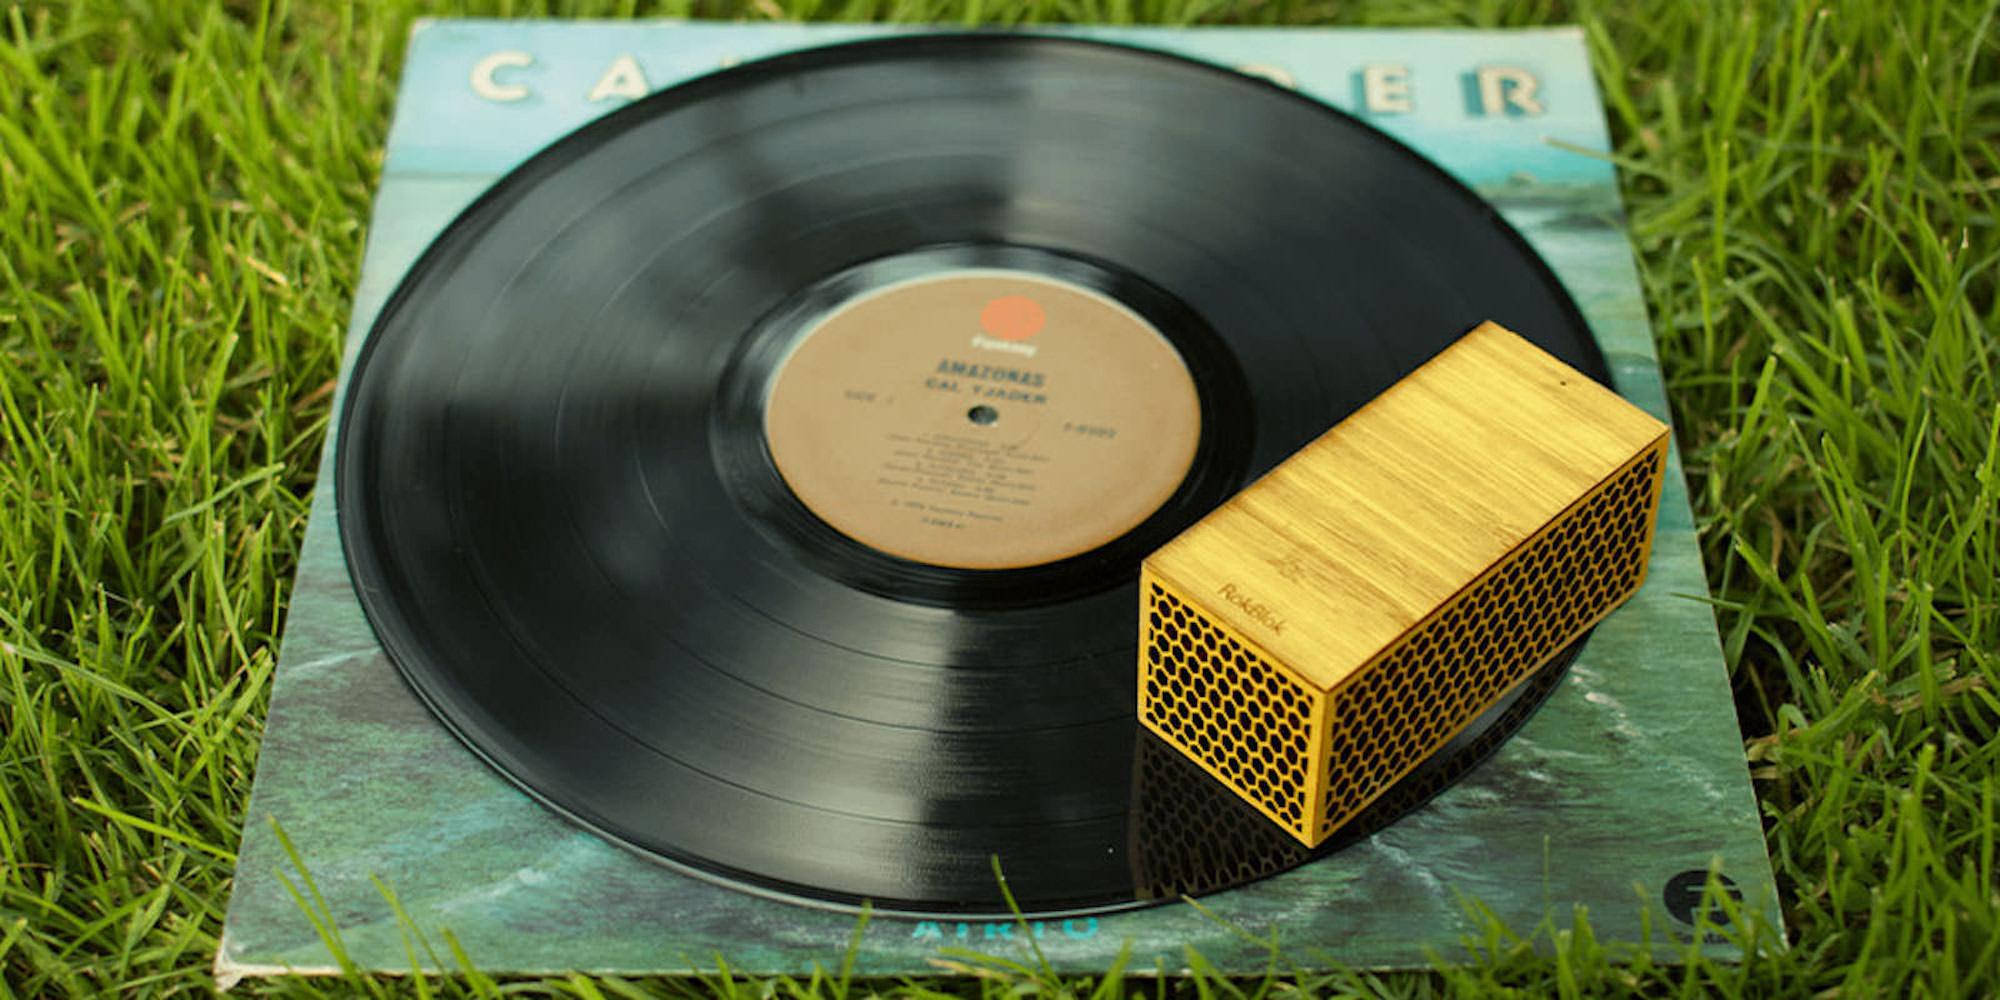 Get RokBlok, the World's Smallest Wireless Record Player: $71 (Orig. $99)